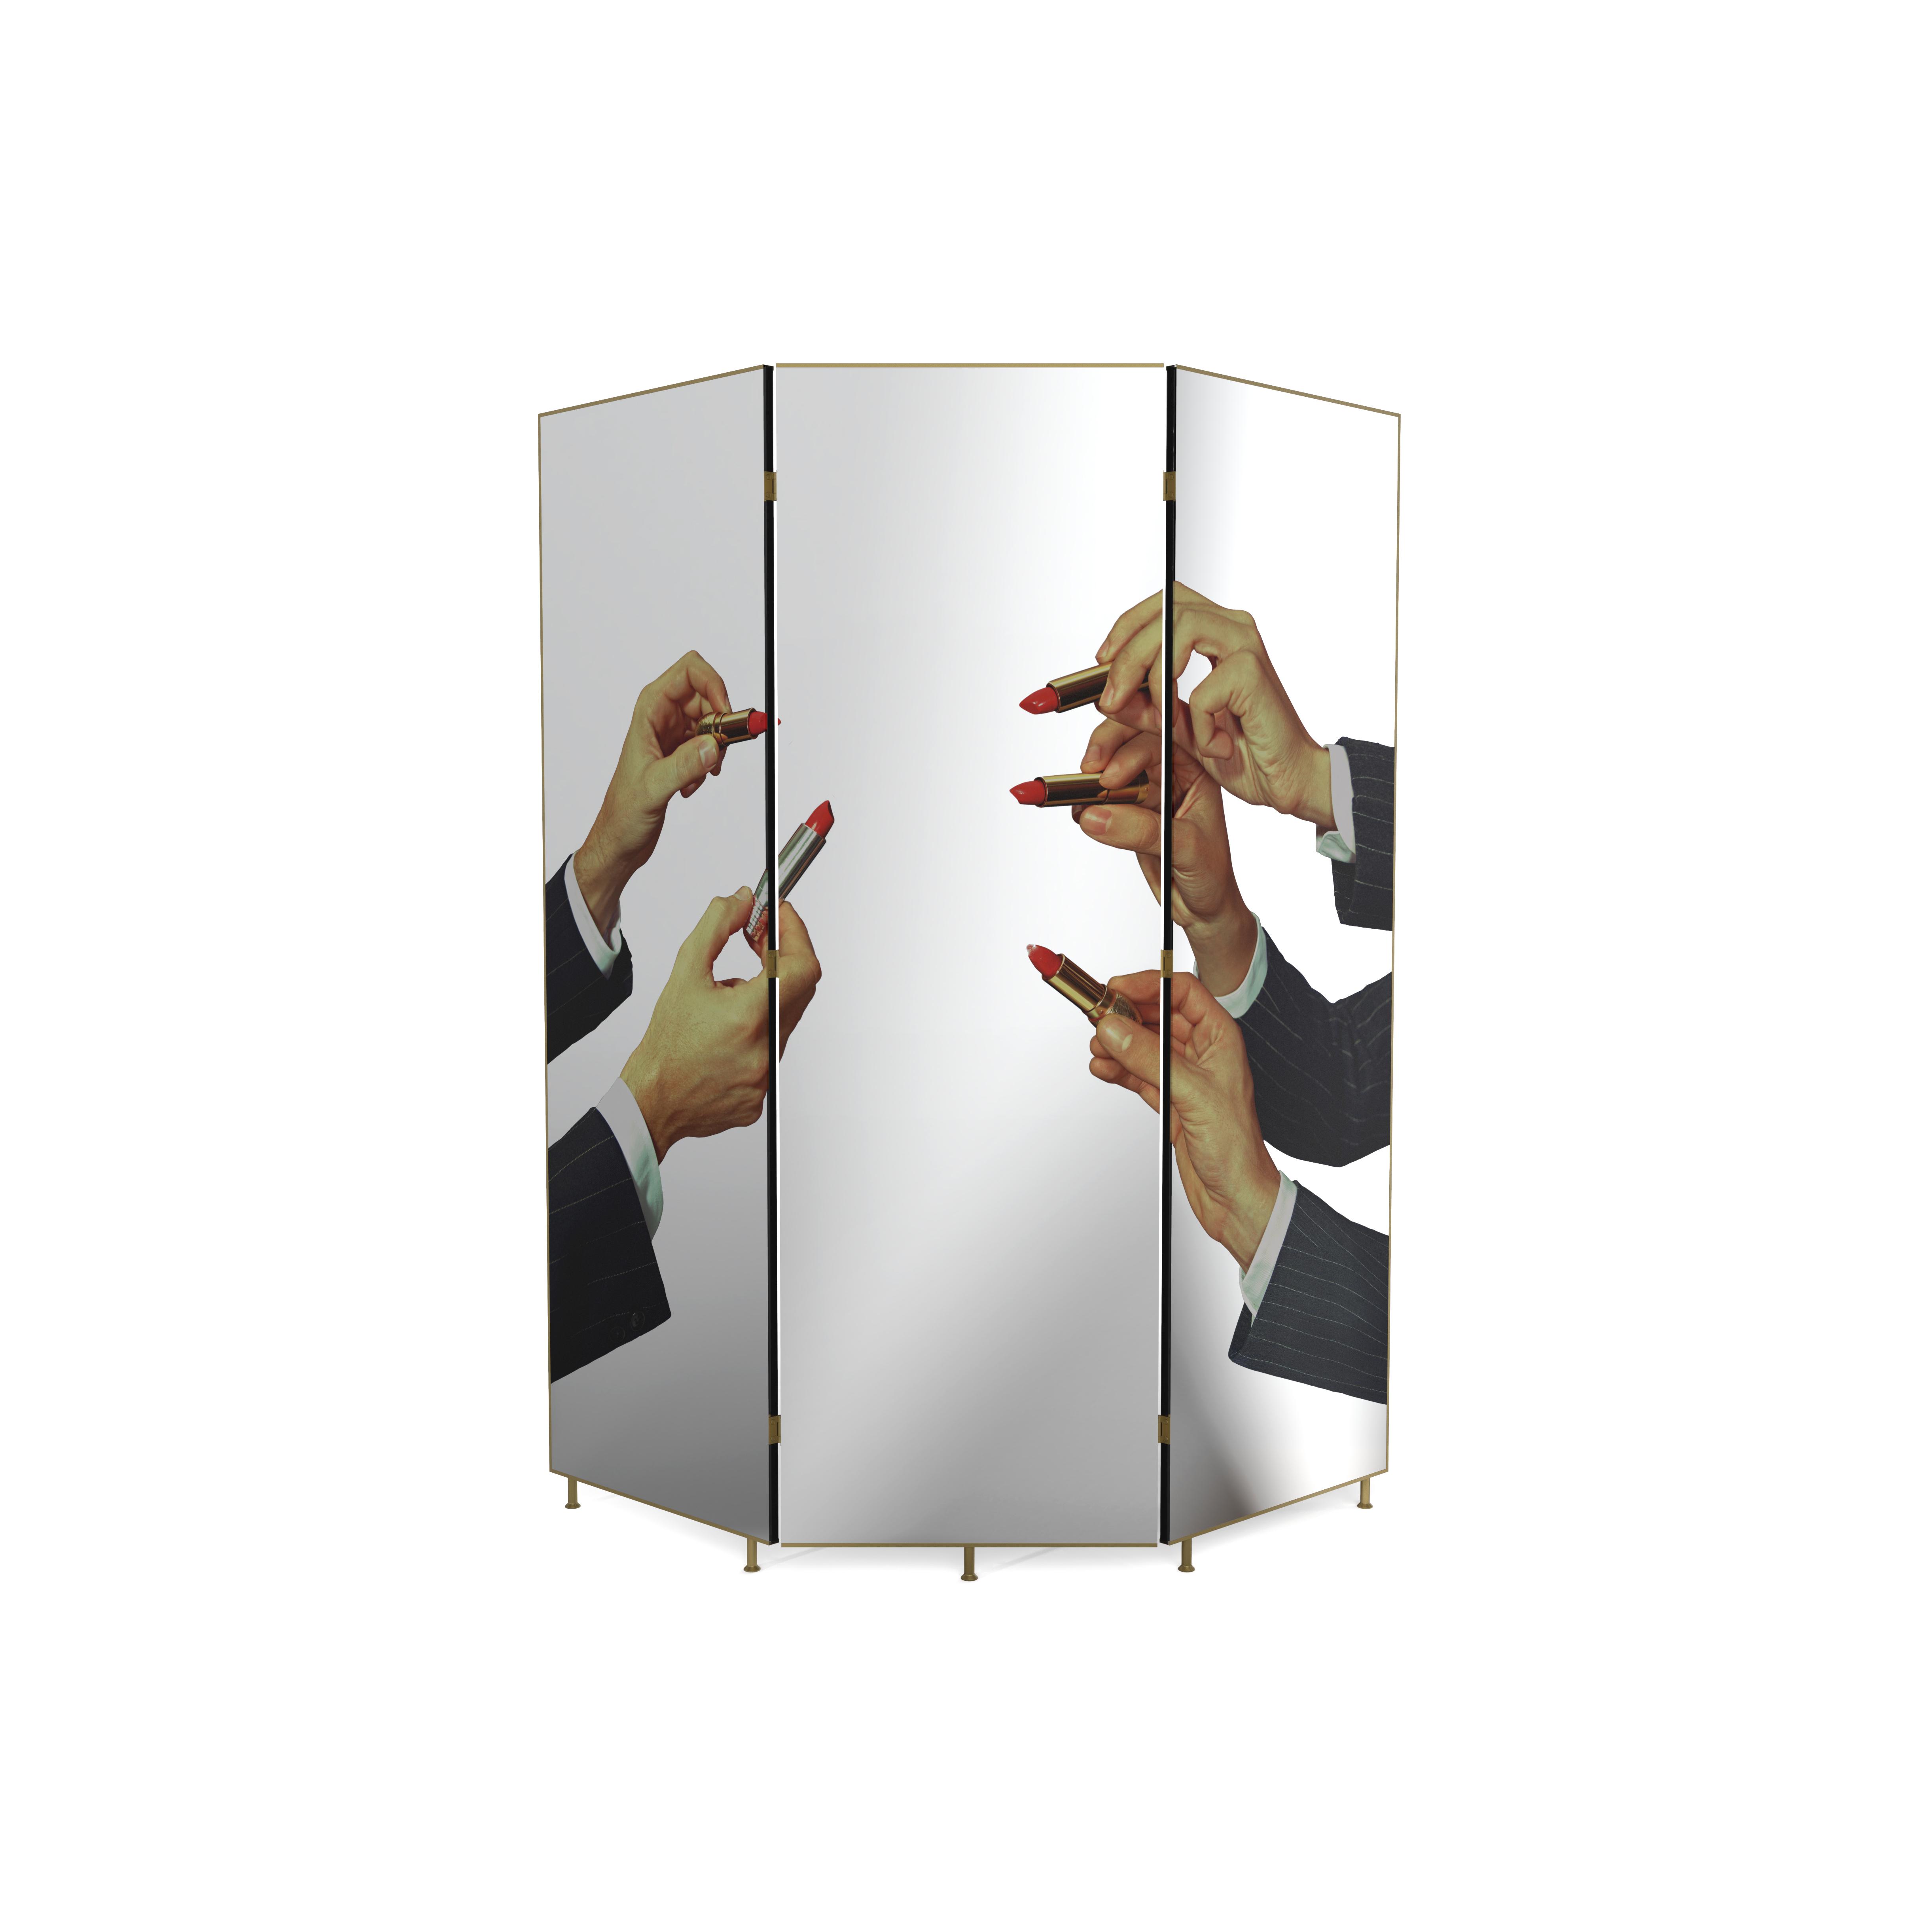 toiletpaper seletti milao 2021 tendencia design decoracao arquitetura